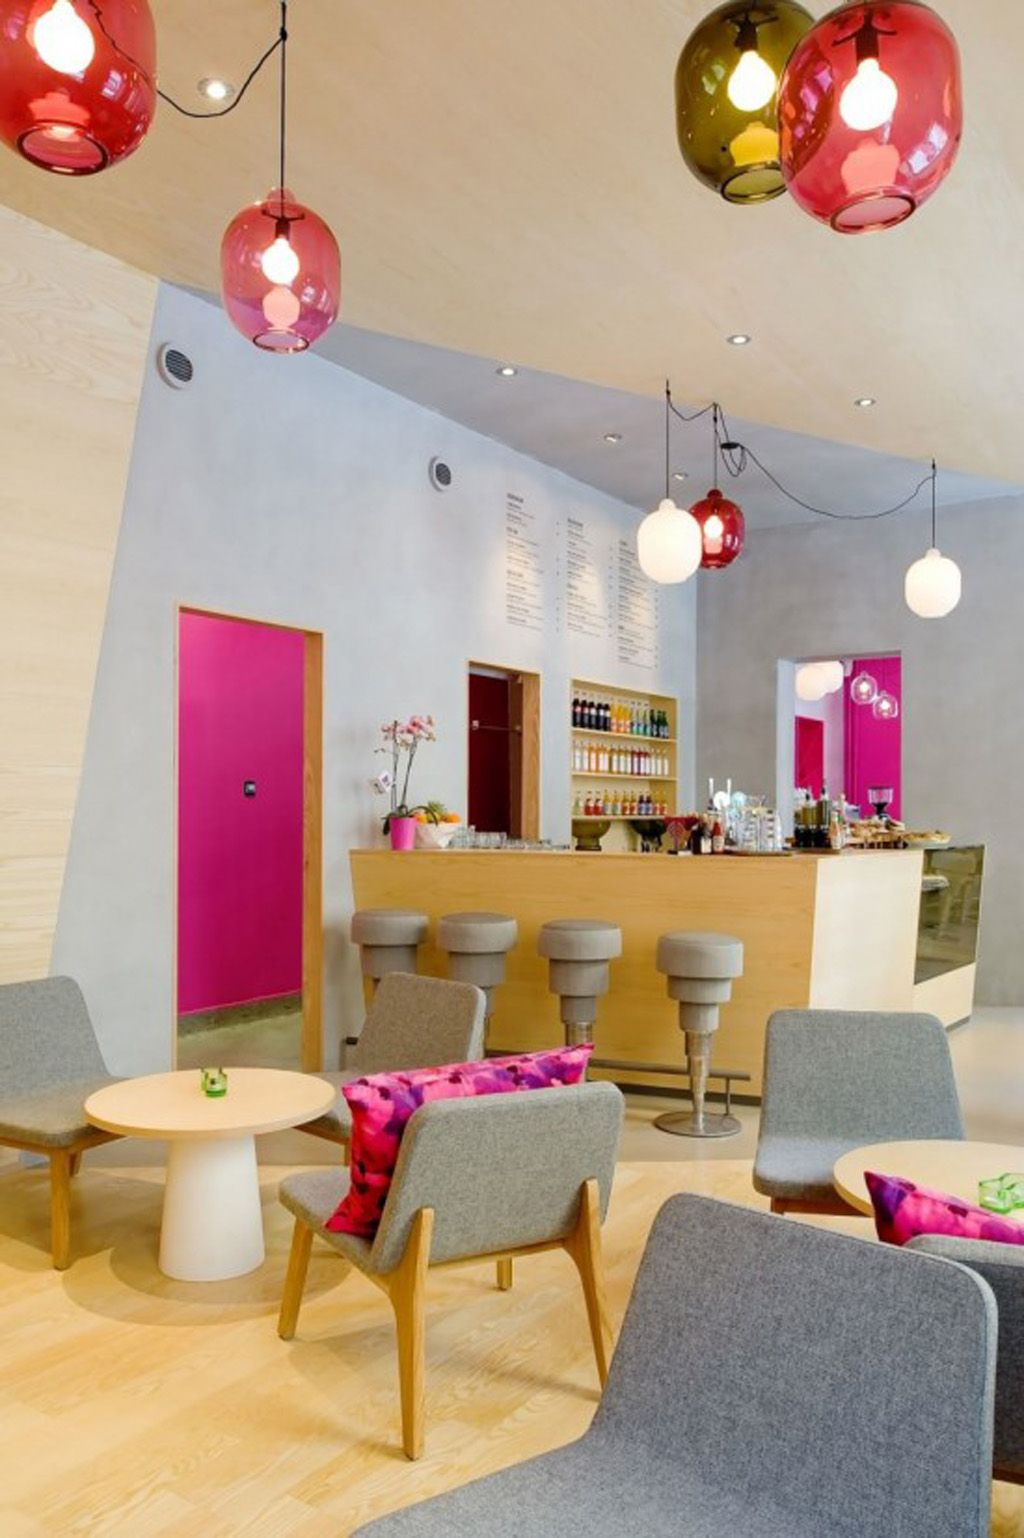 Decorative cafe decor idea decorative cafe decor idea more commercial interiors note design